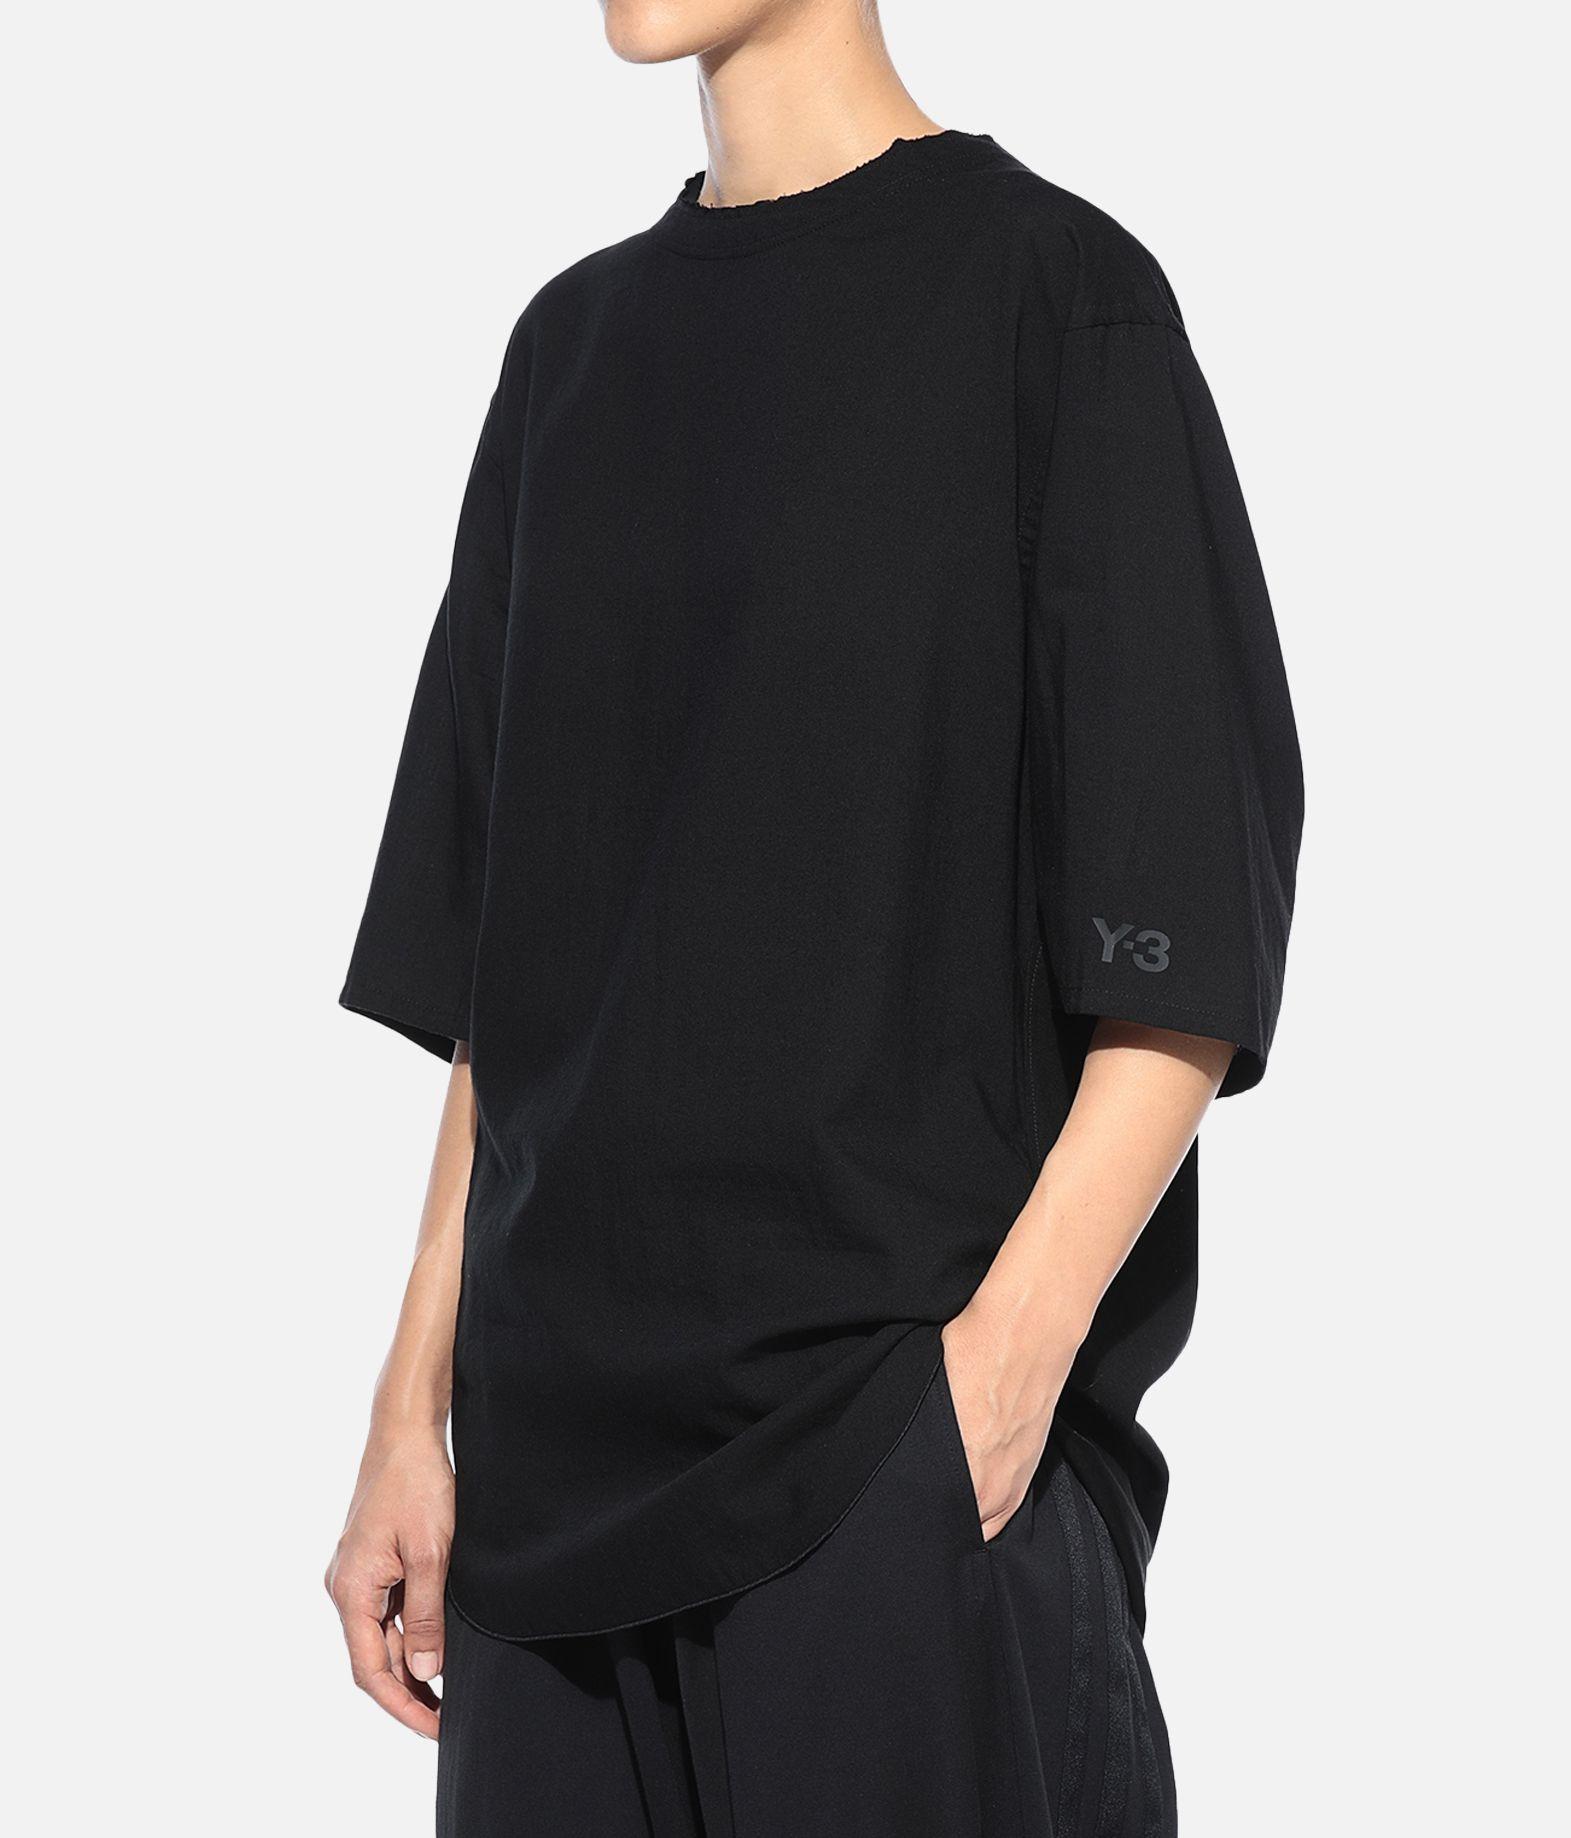 Y-3 Y-3 Long Tee Kurzärmliges T-shirt Damen e